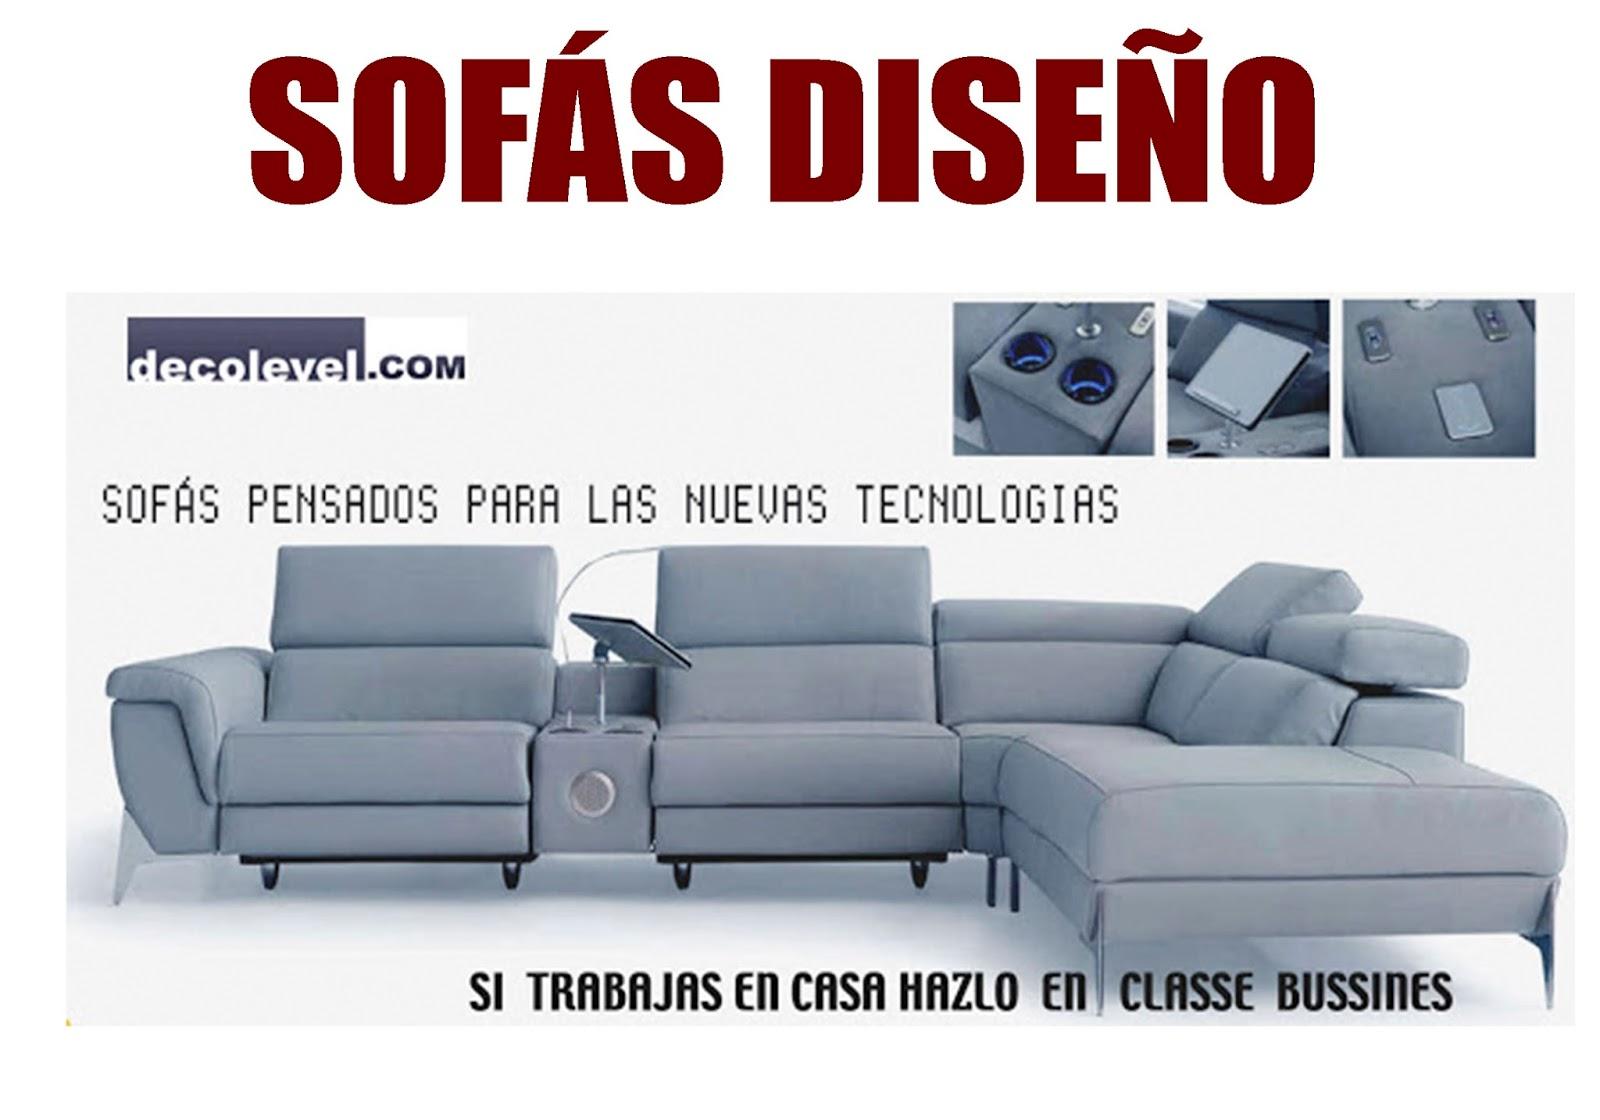 SOFAS DISEÑO BARCELONA | DECOLEVEL: SOFAS - MUEBLES - ARMARIOS - JUVENIL